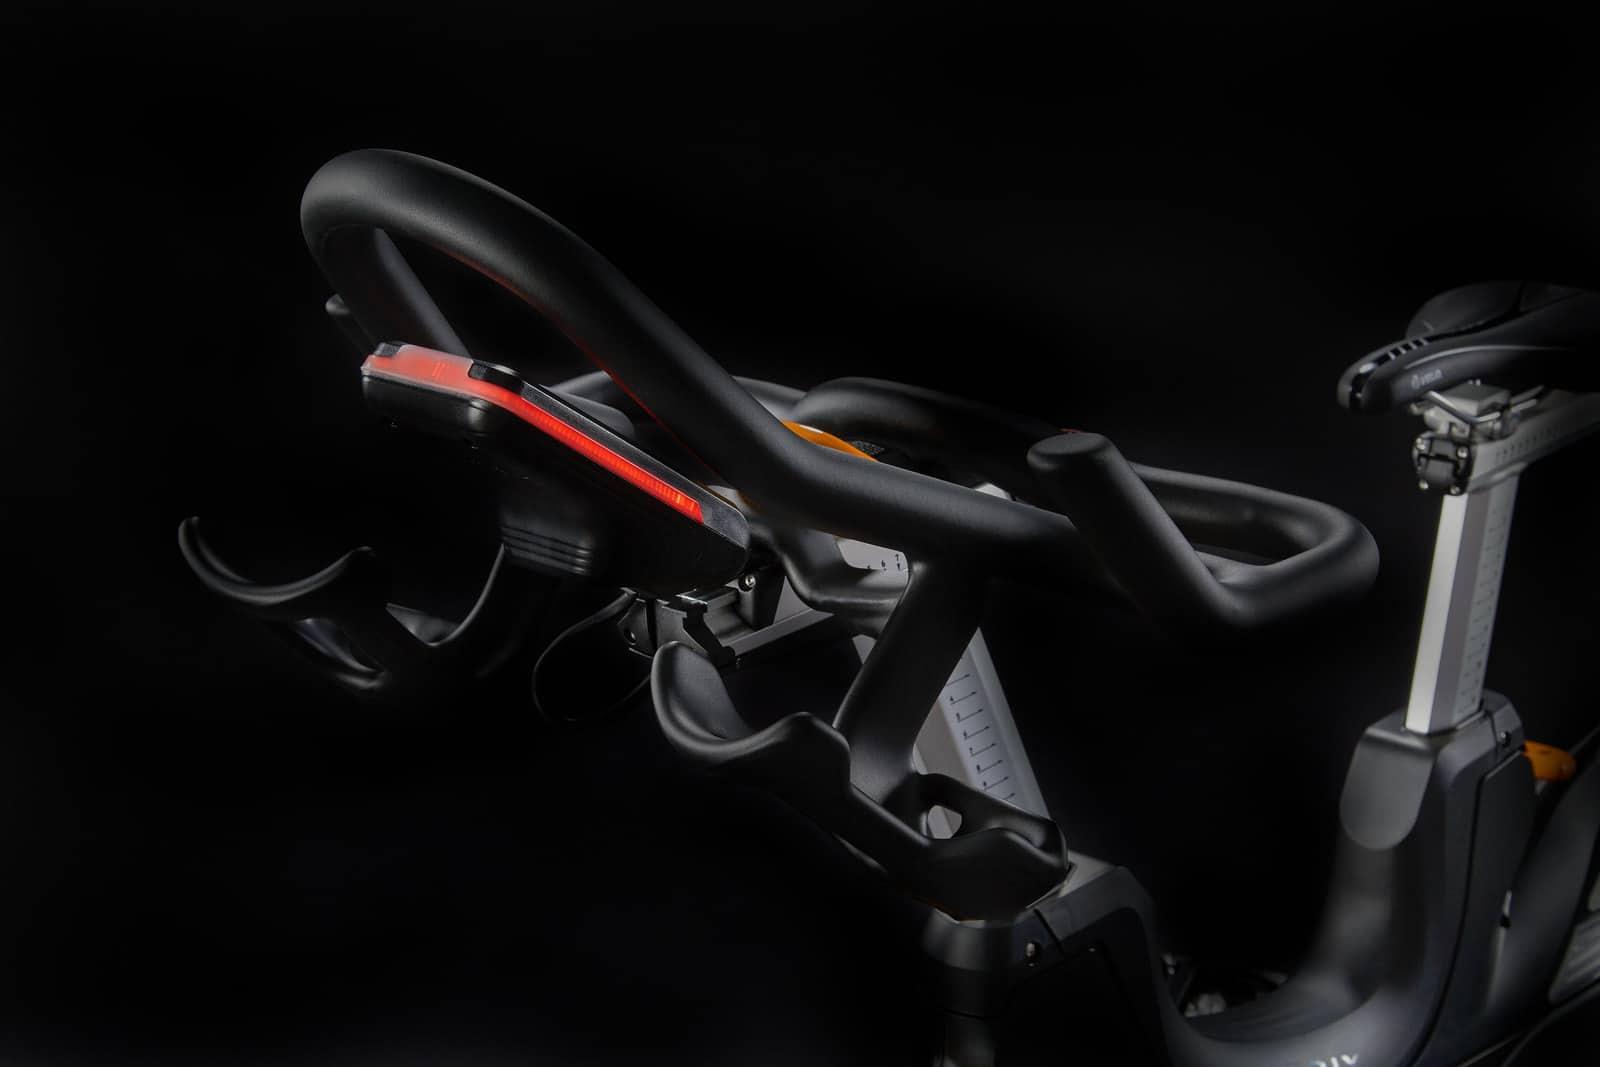 GYMUTRUSTNING matrix indoor bike traget training cykel träningcykel spinning kondition cy